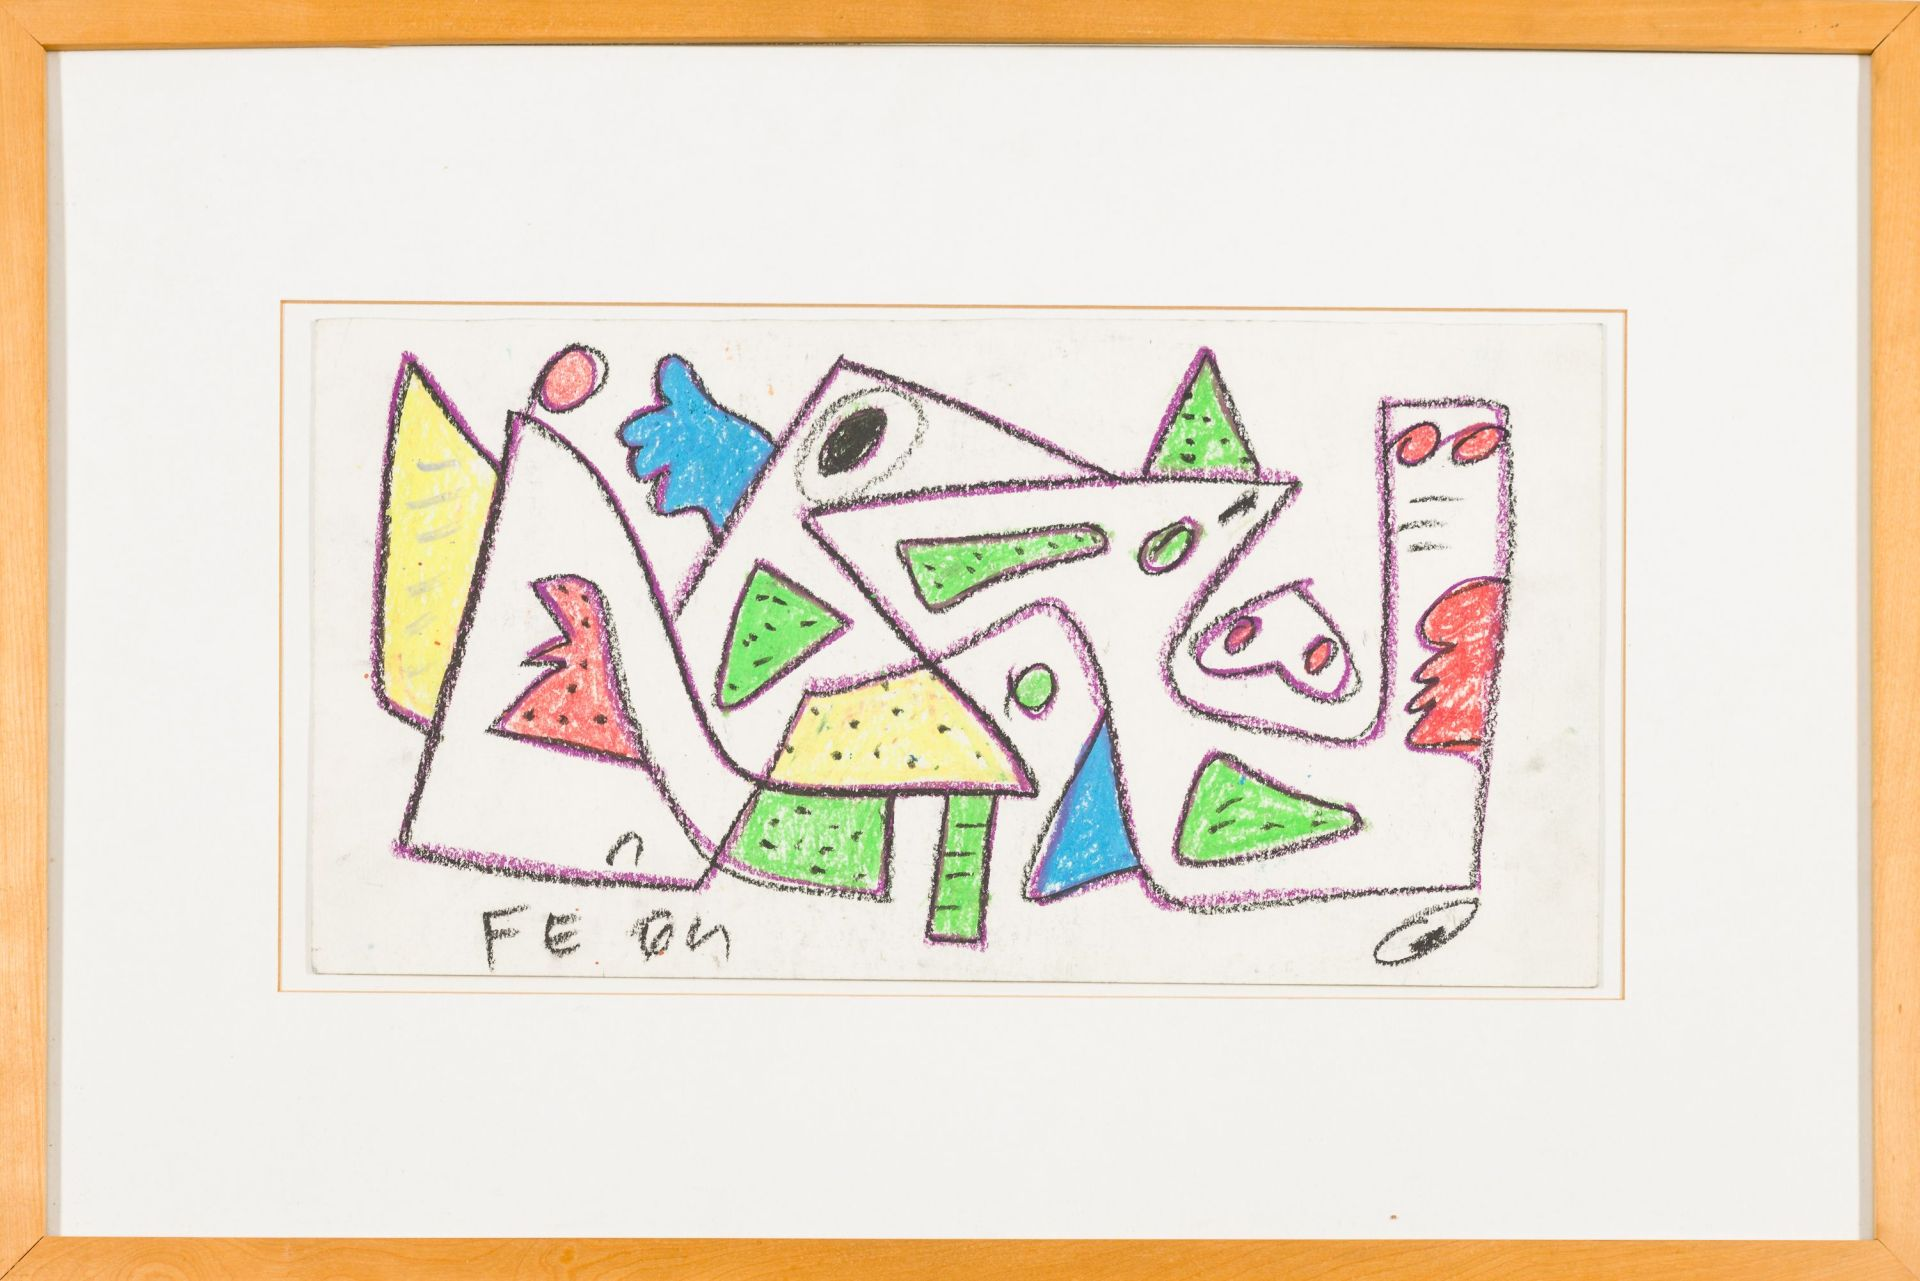 Franz Ecker-Abstract Composition 1964